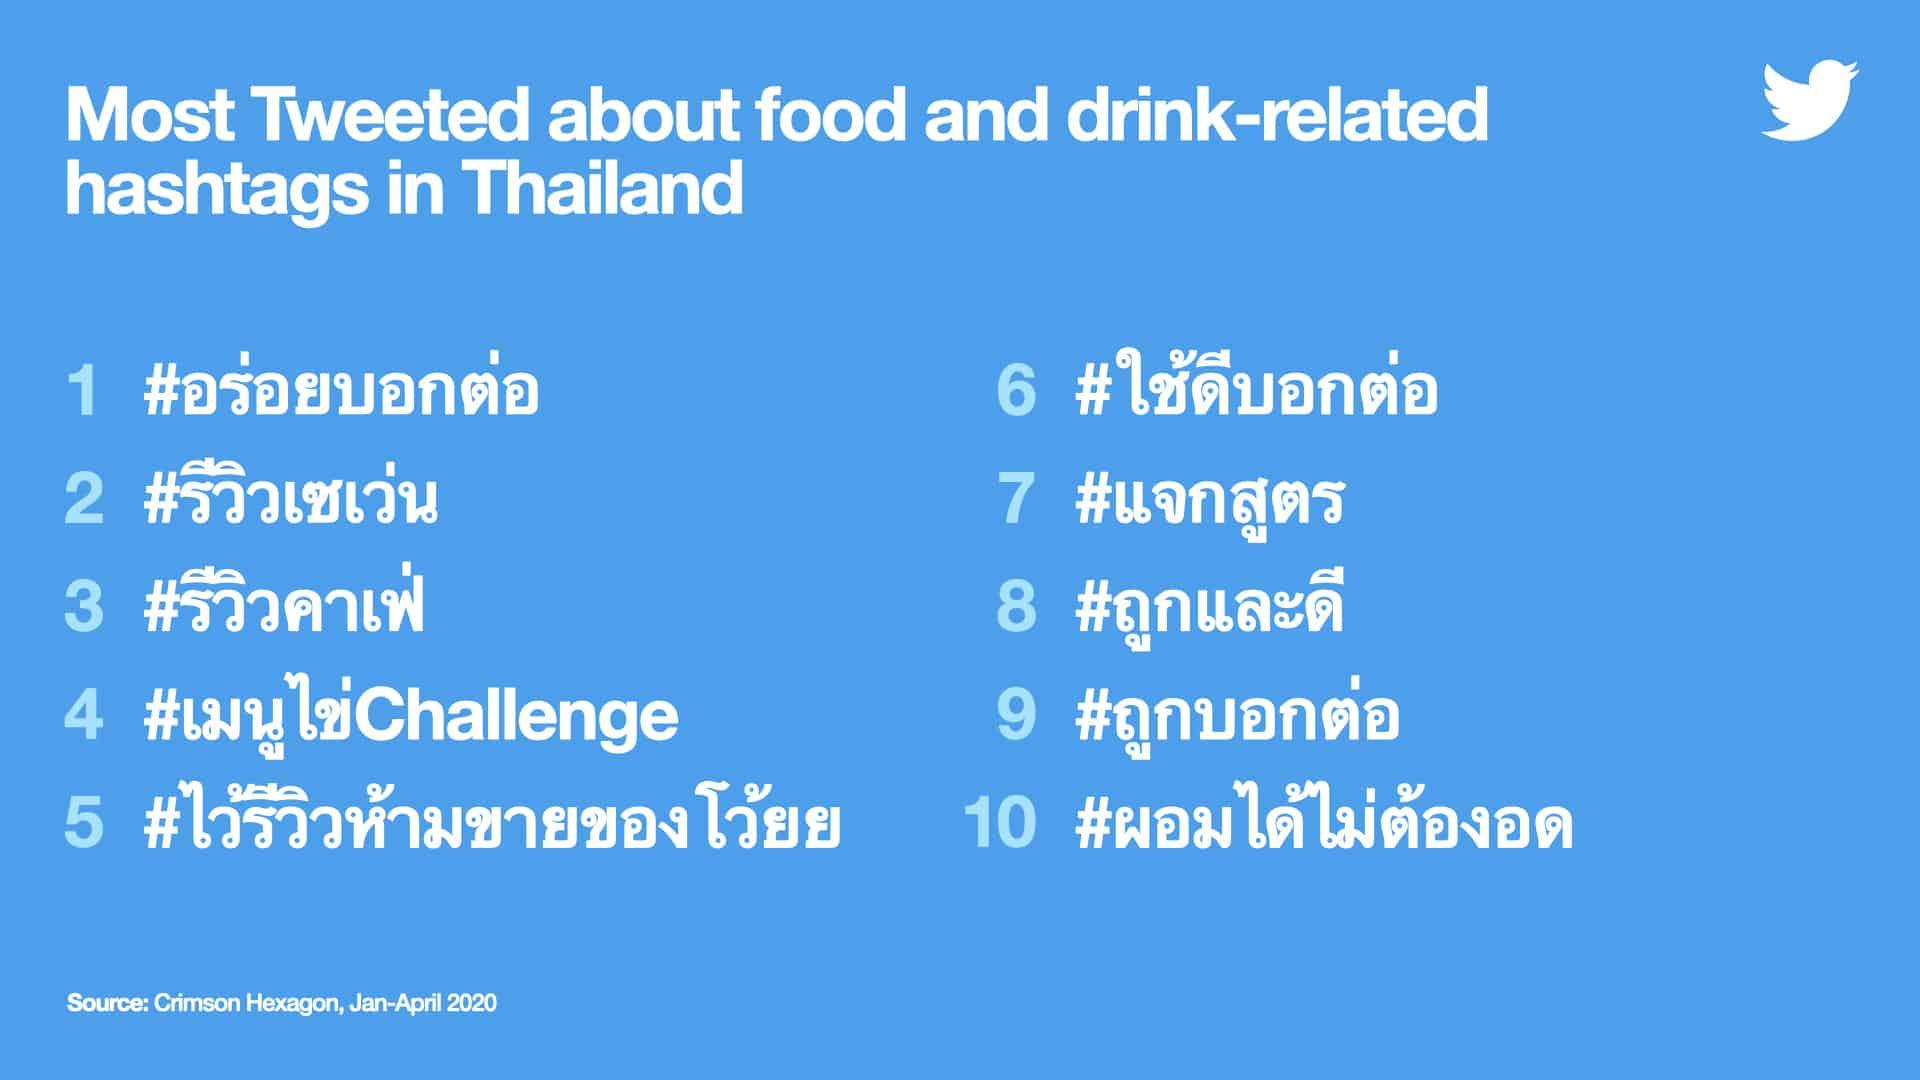 #StayAtHome กักตัวอยู่บ้านทำเอาคนไทยพูดคุยเรื่องกินบน Twitter เพิ่มขึ้น 56%